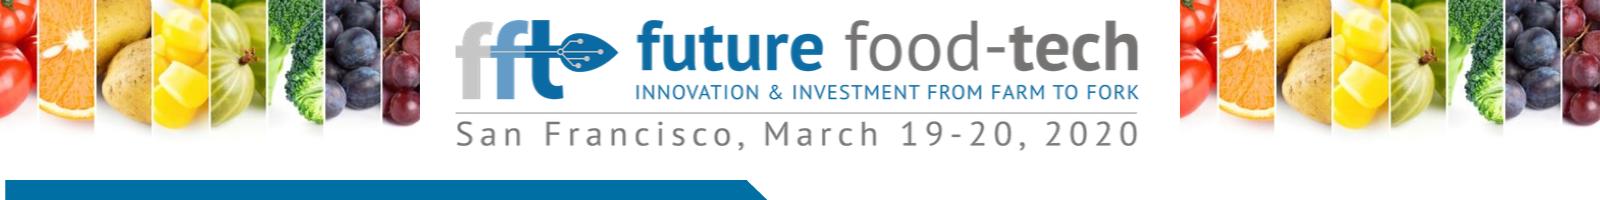 Future Food-Tech SF 2020